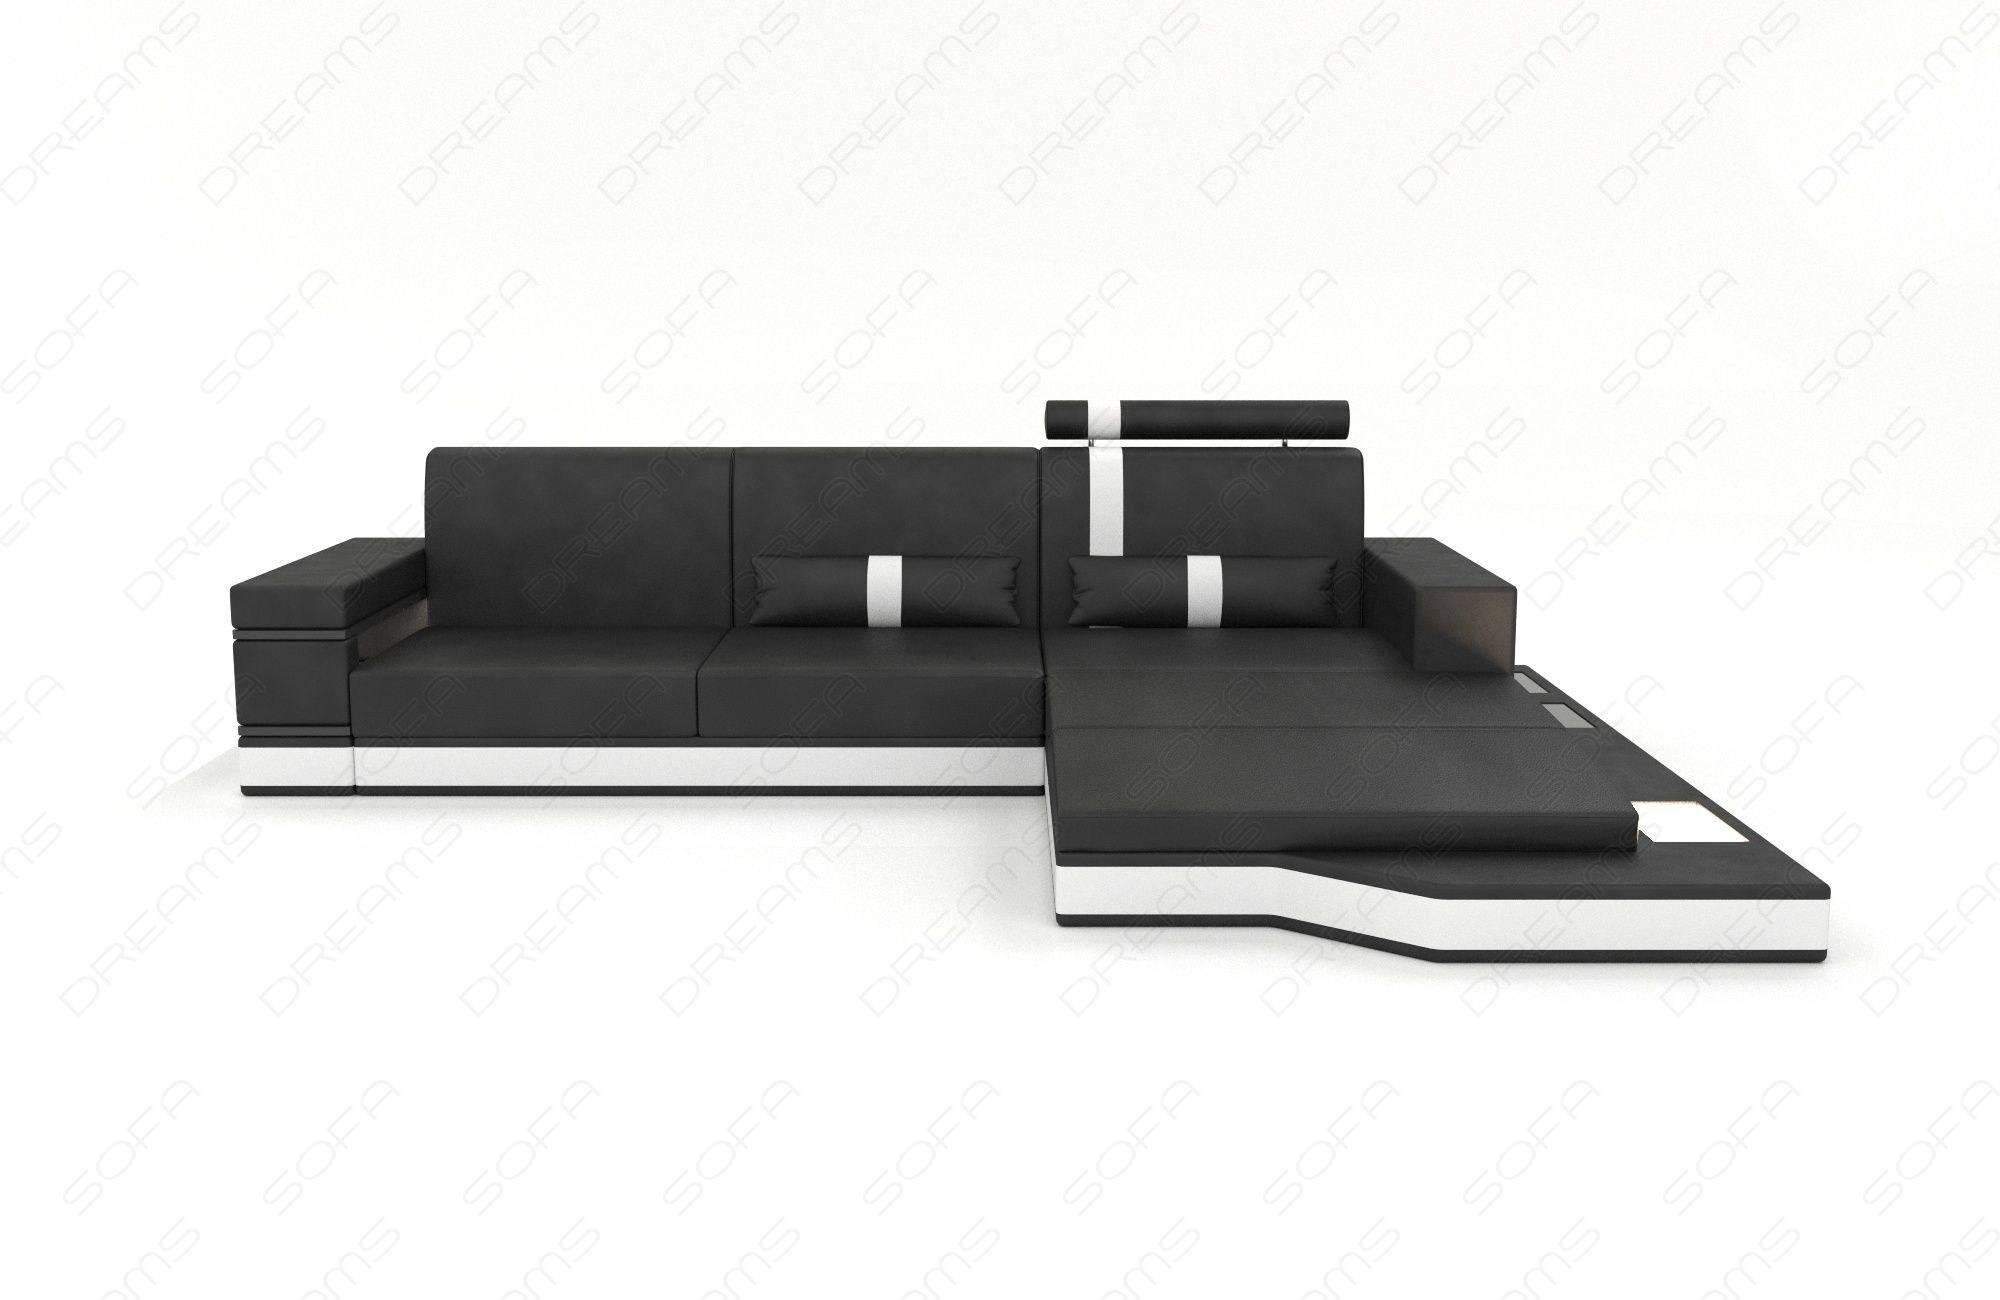 Modern Fabric Sofa Los Angeles L with Lights